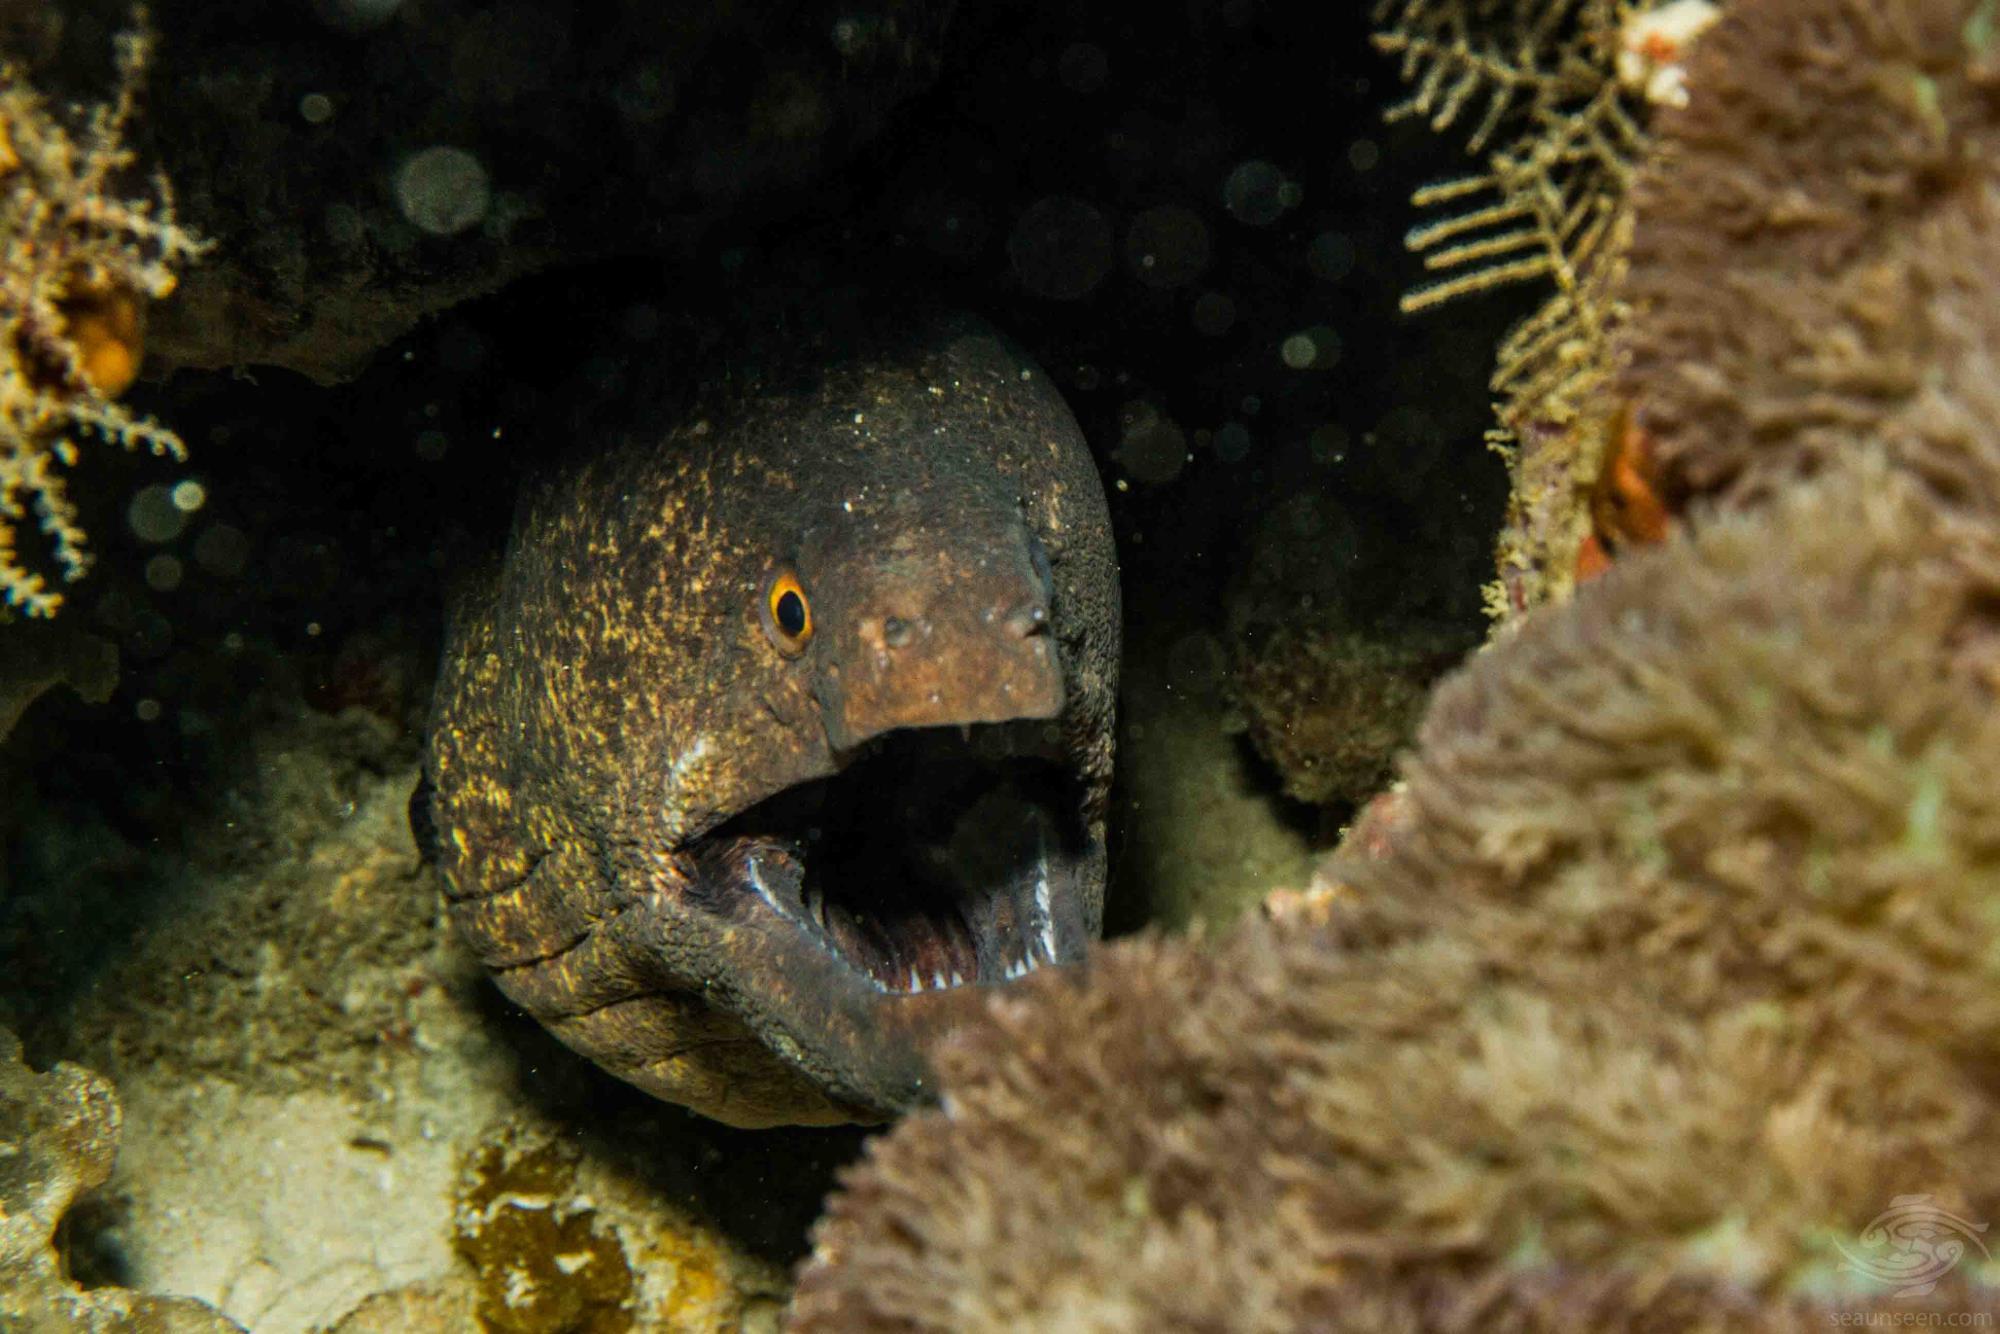 yellow-edged moray eel (Gymnothorax flavimarginatus)